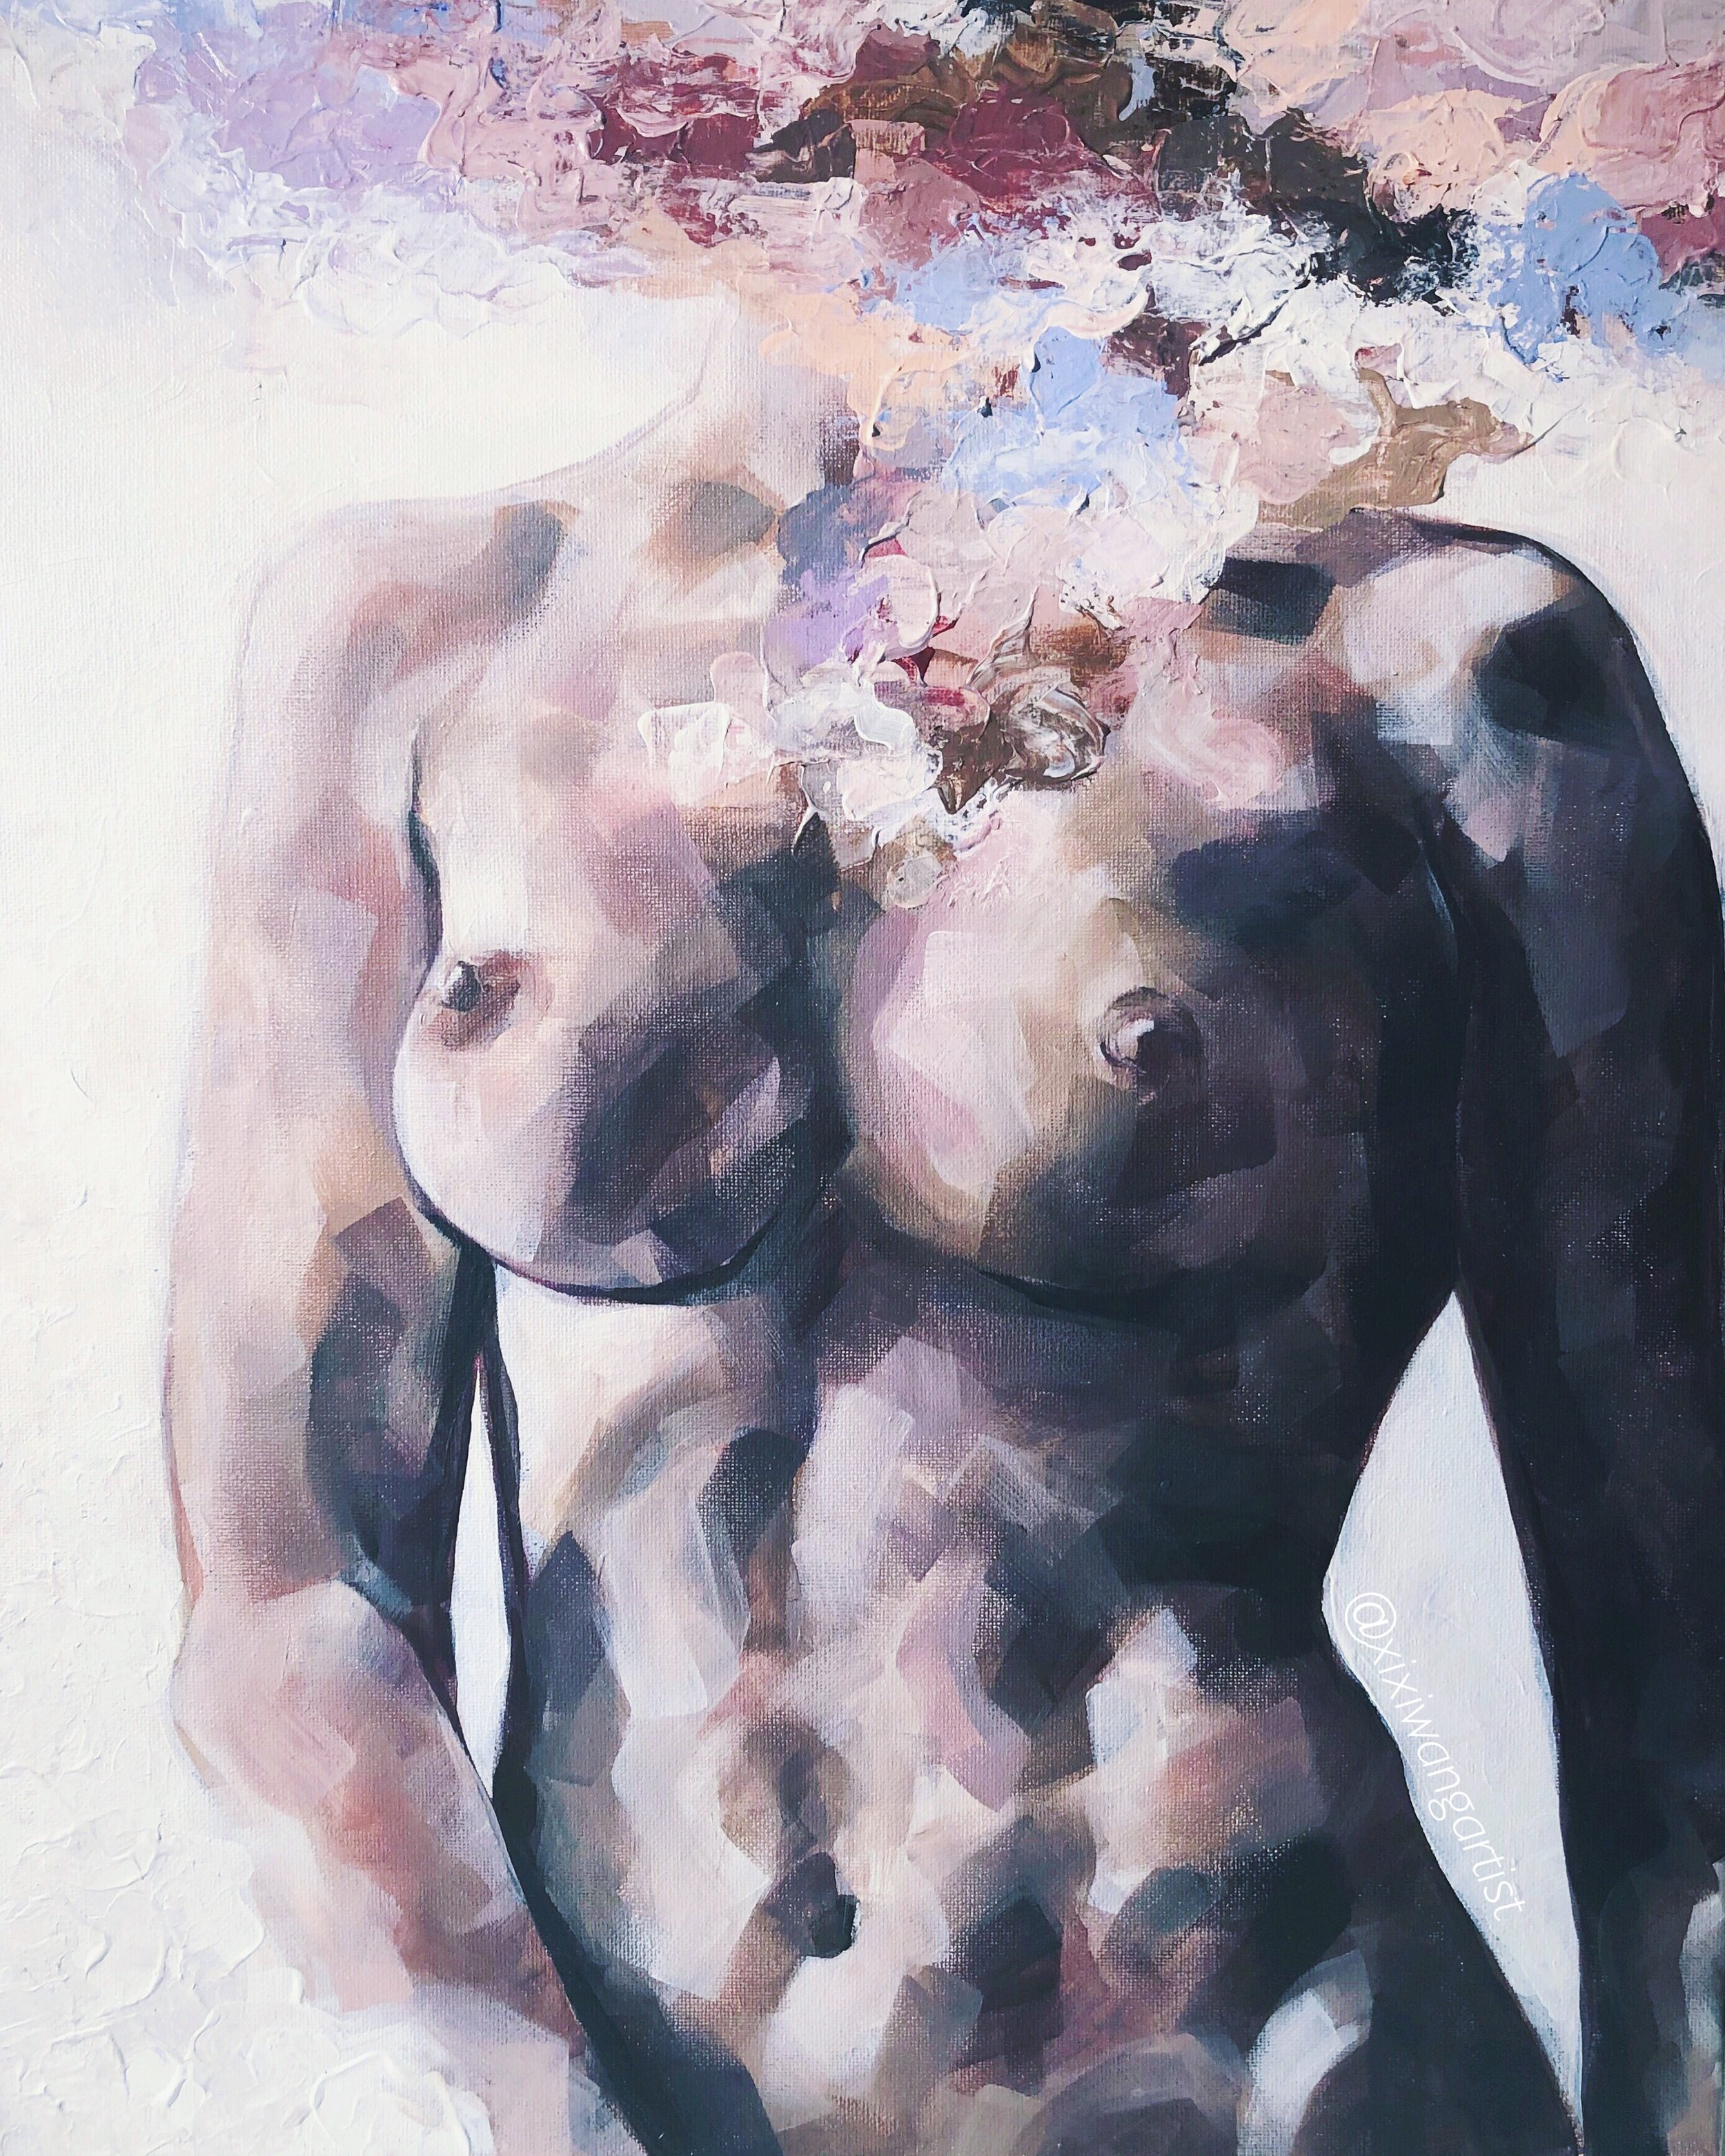 Her Fight the Fury, Xixi Wang, acrylic on canvas, 16x20, $1200.JPG